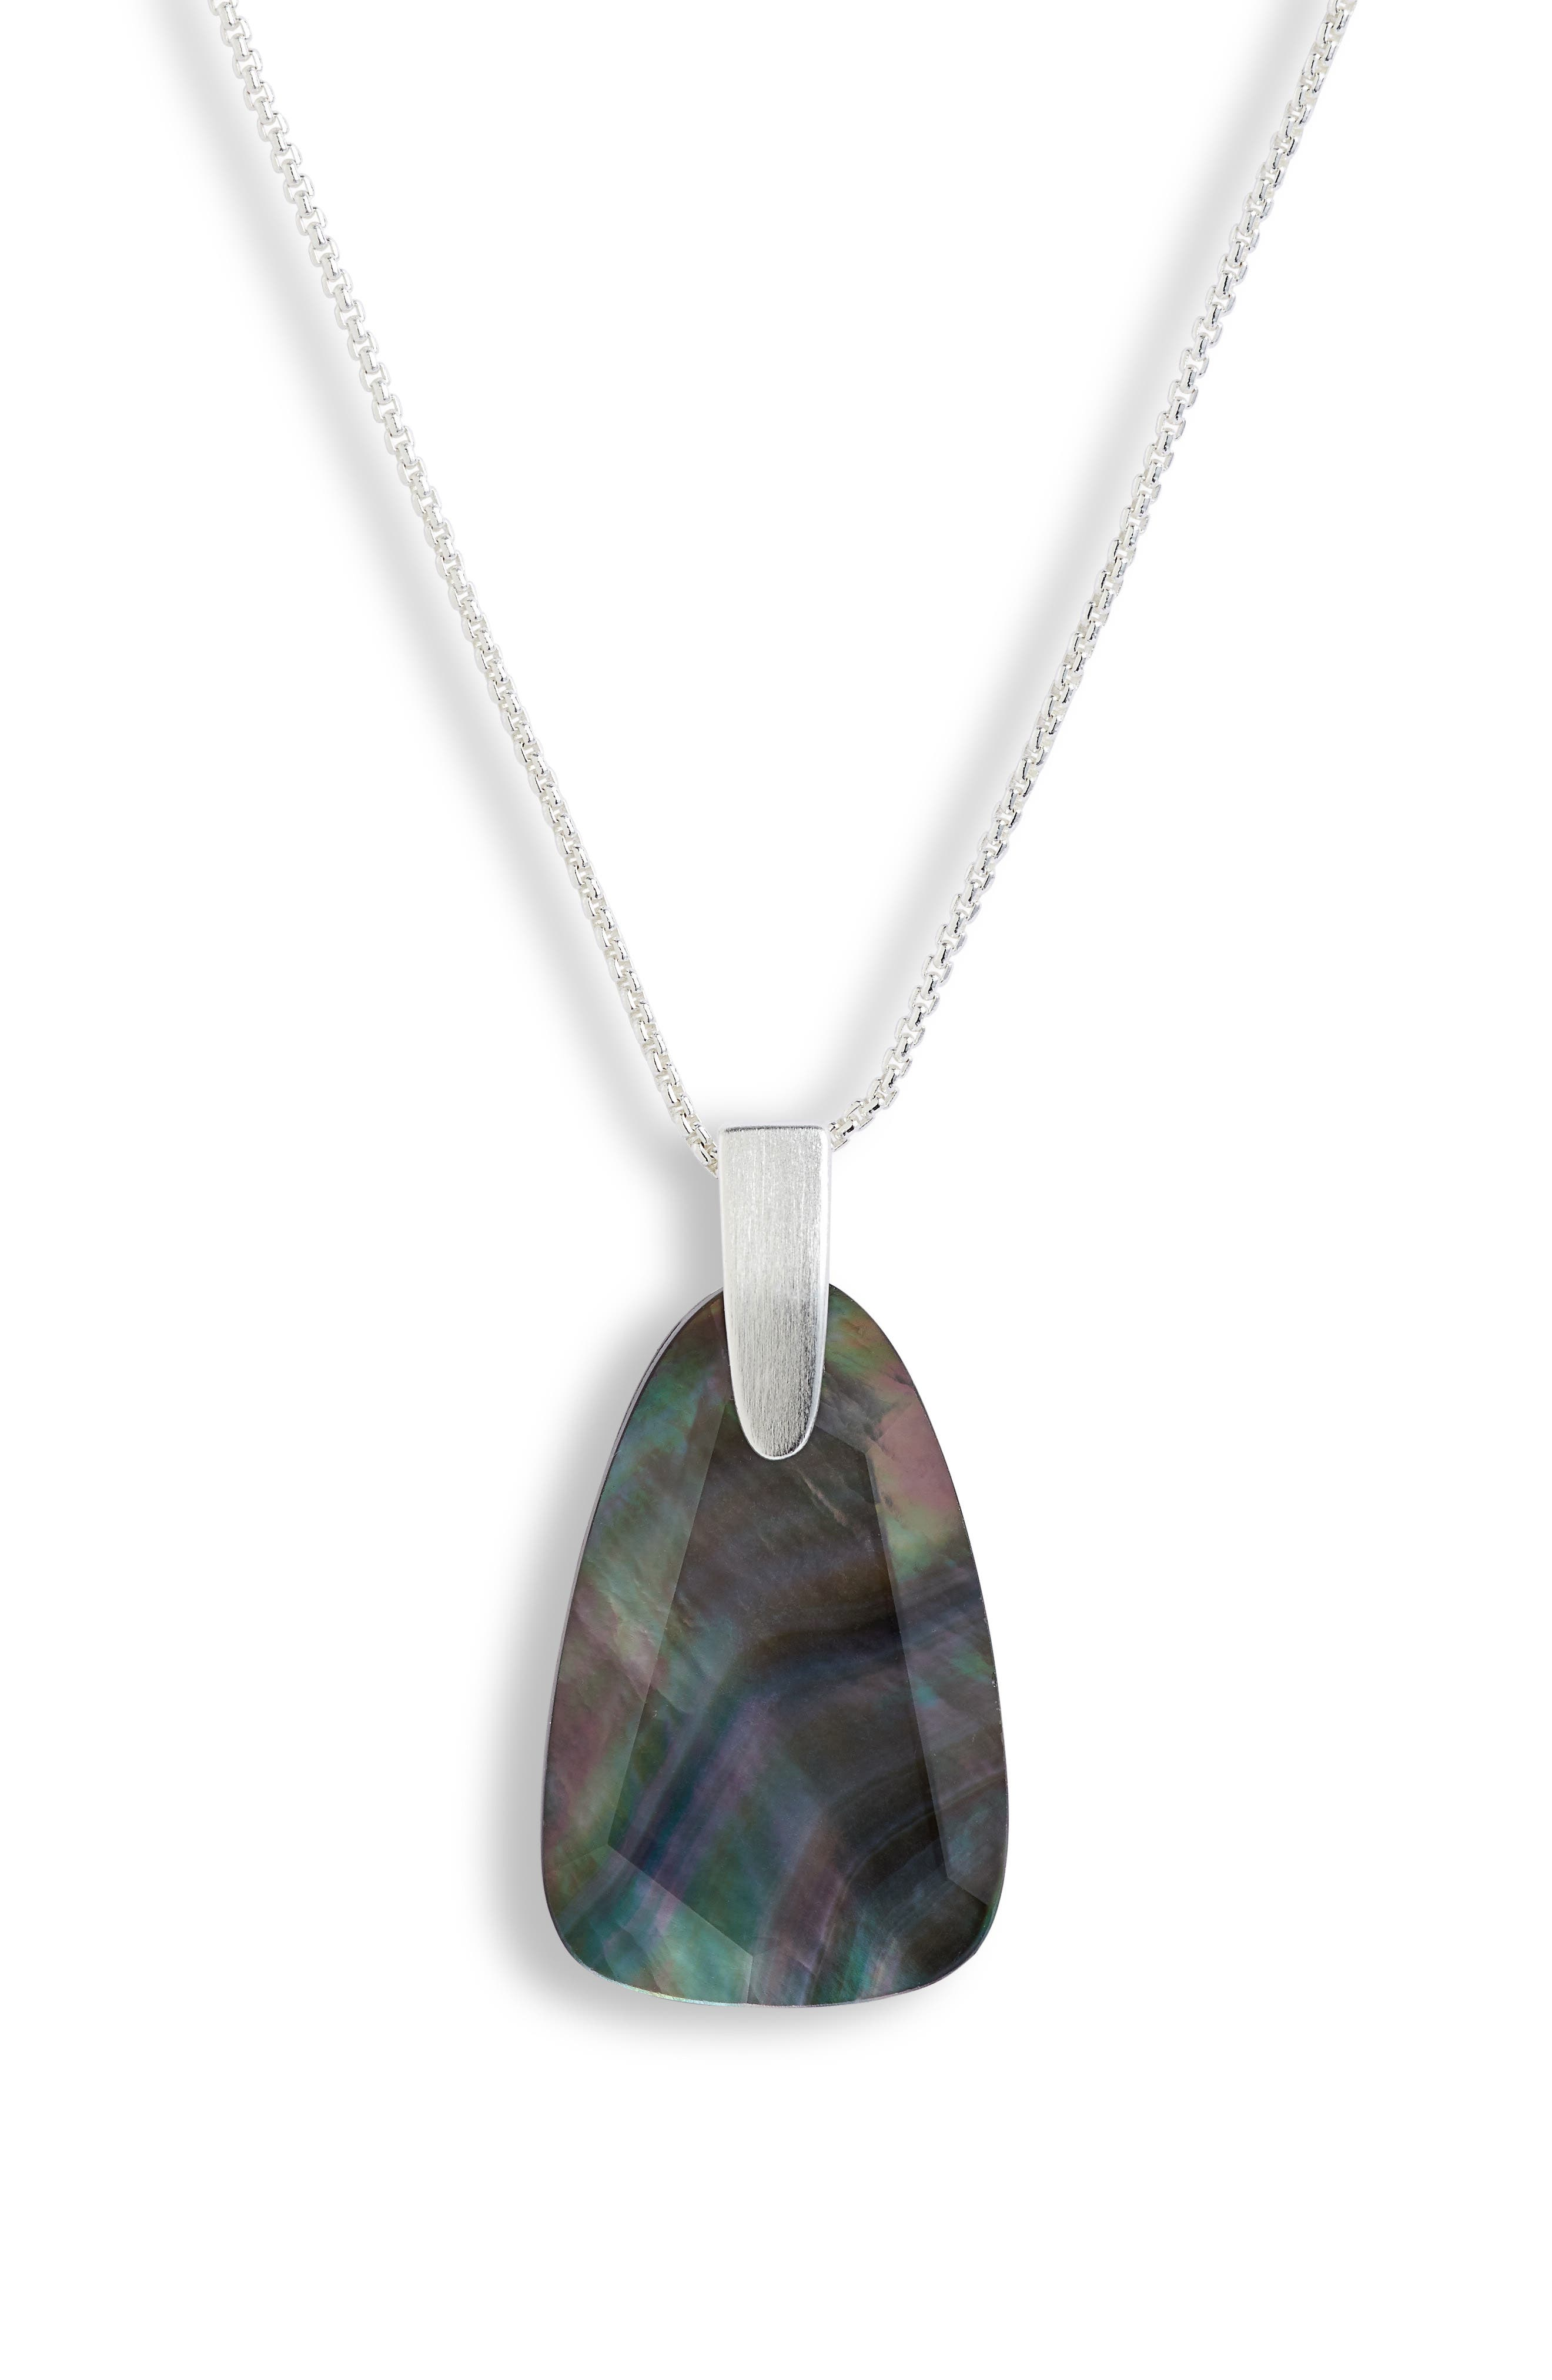 KENDRA SCOTT, Maeve Long Stone Pendant Necklace, Alternate thumbnail 3, color, BRIGHT SILVER/ BLACK MOP